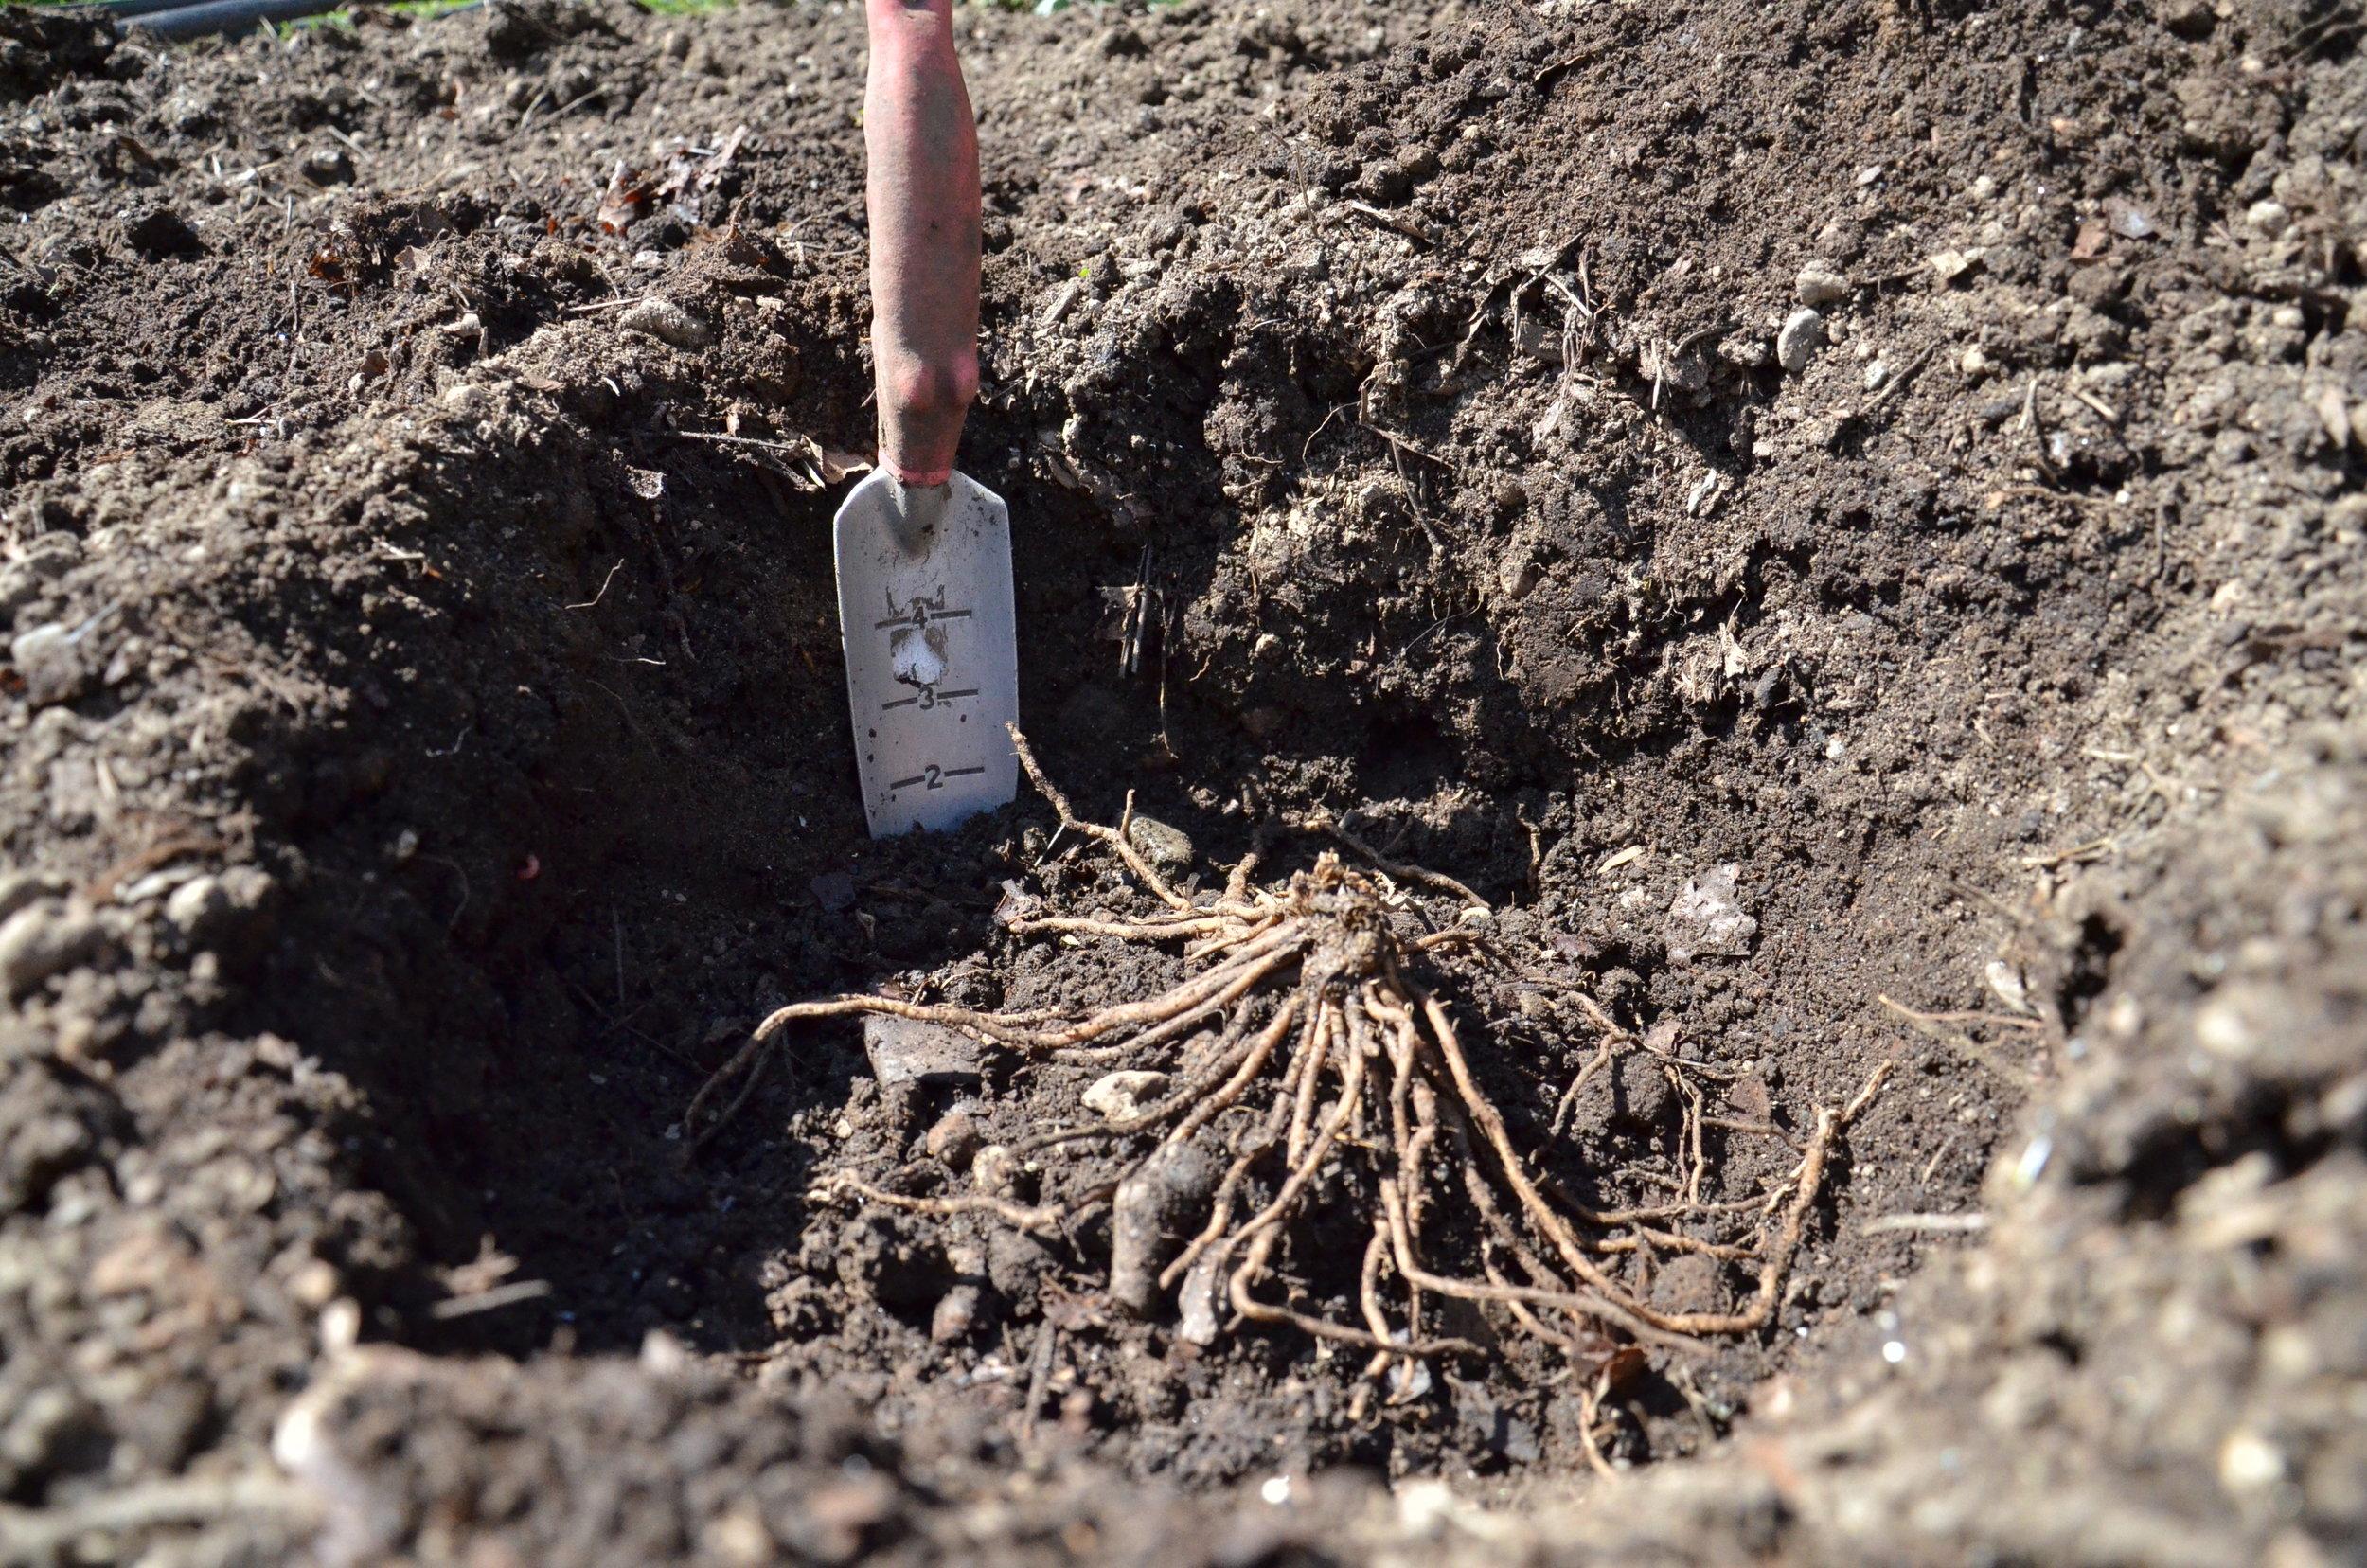 Planting asparagus_Seattle Urban Farm Co._Encyclopedia Botanica